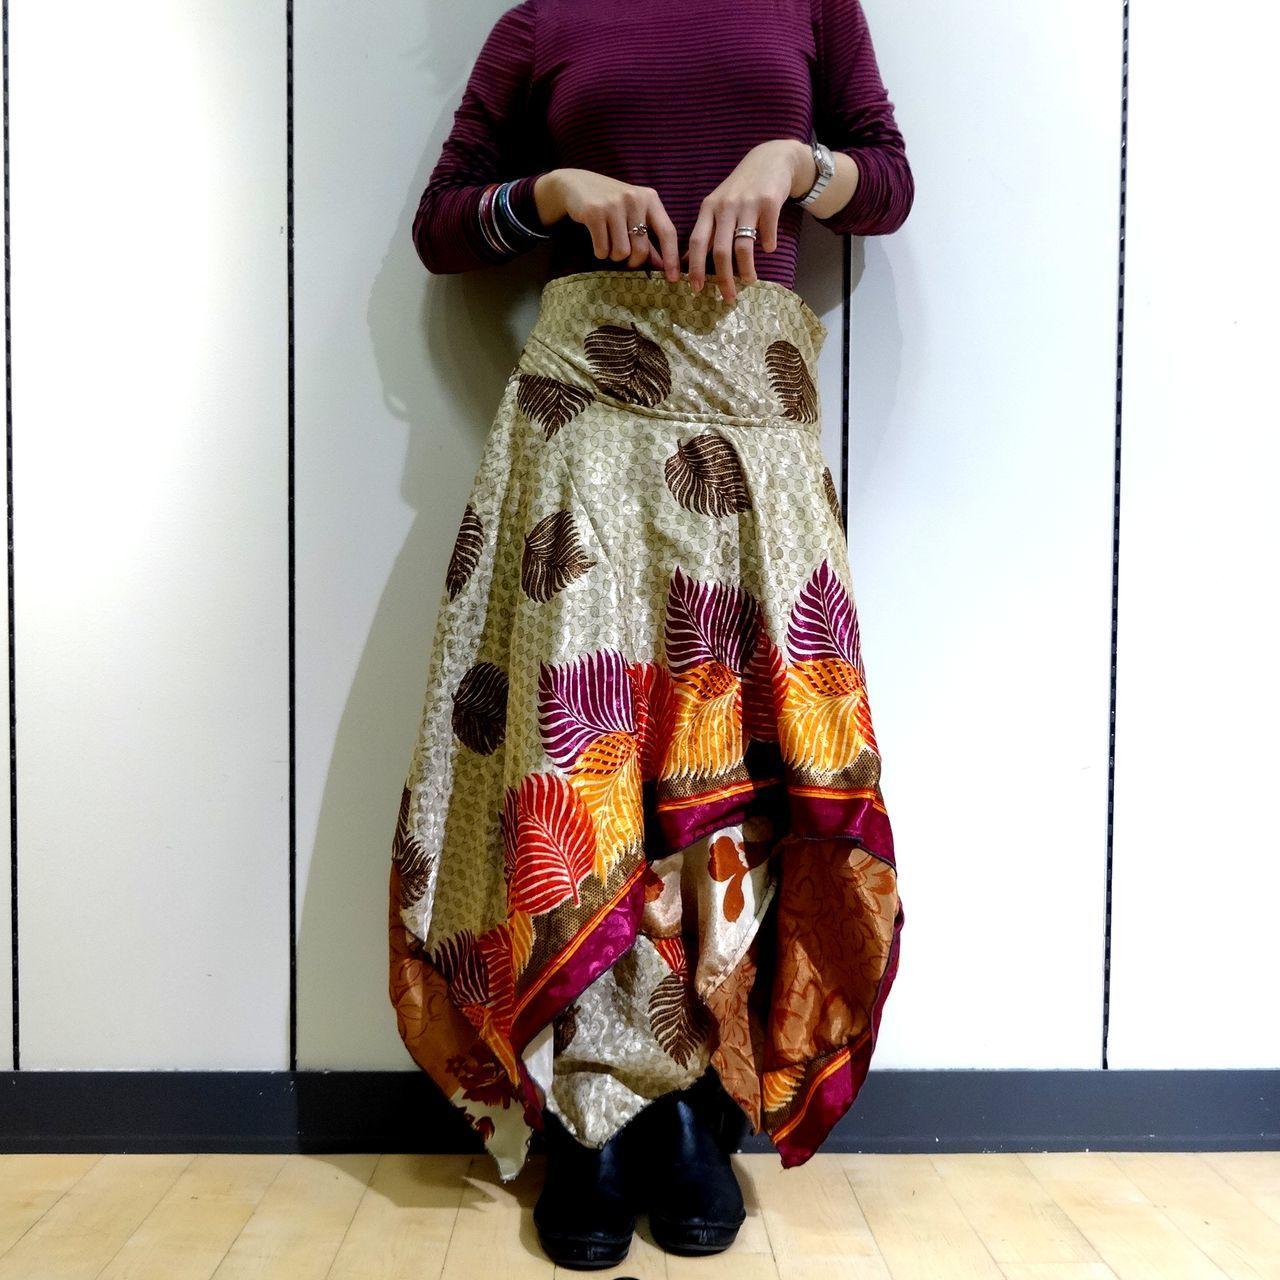 vdsz-018  ビンテージシルクサリーギザスカート「ソテツ」